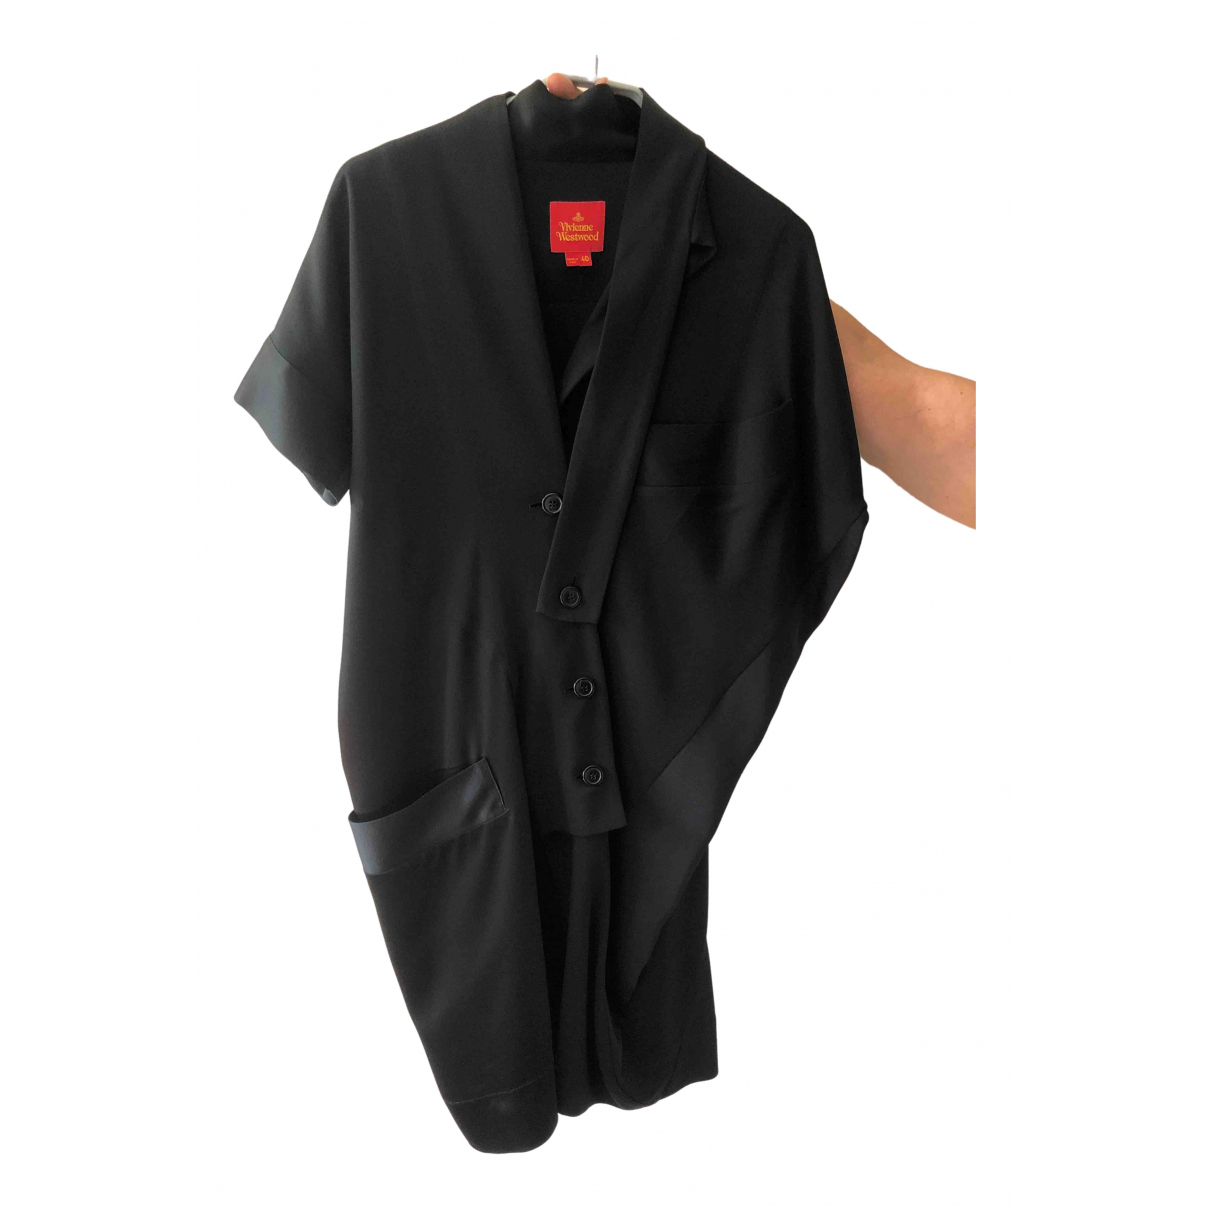 Vestido midi Vivienne Westwood Red Label